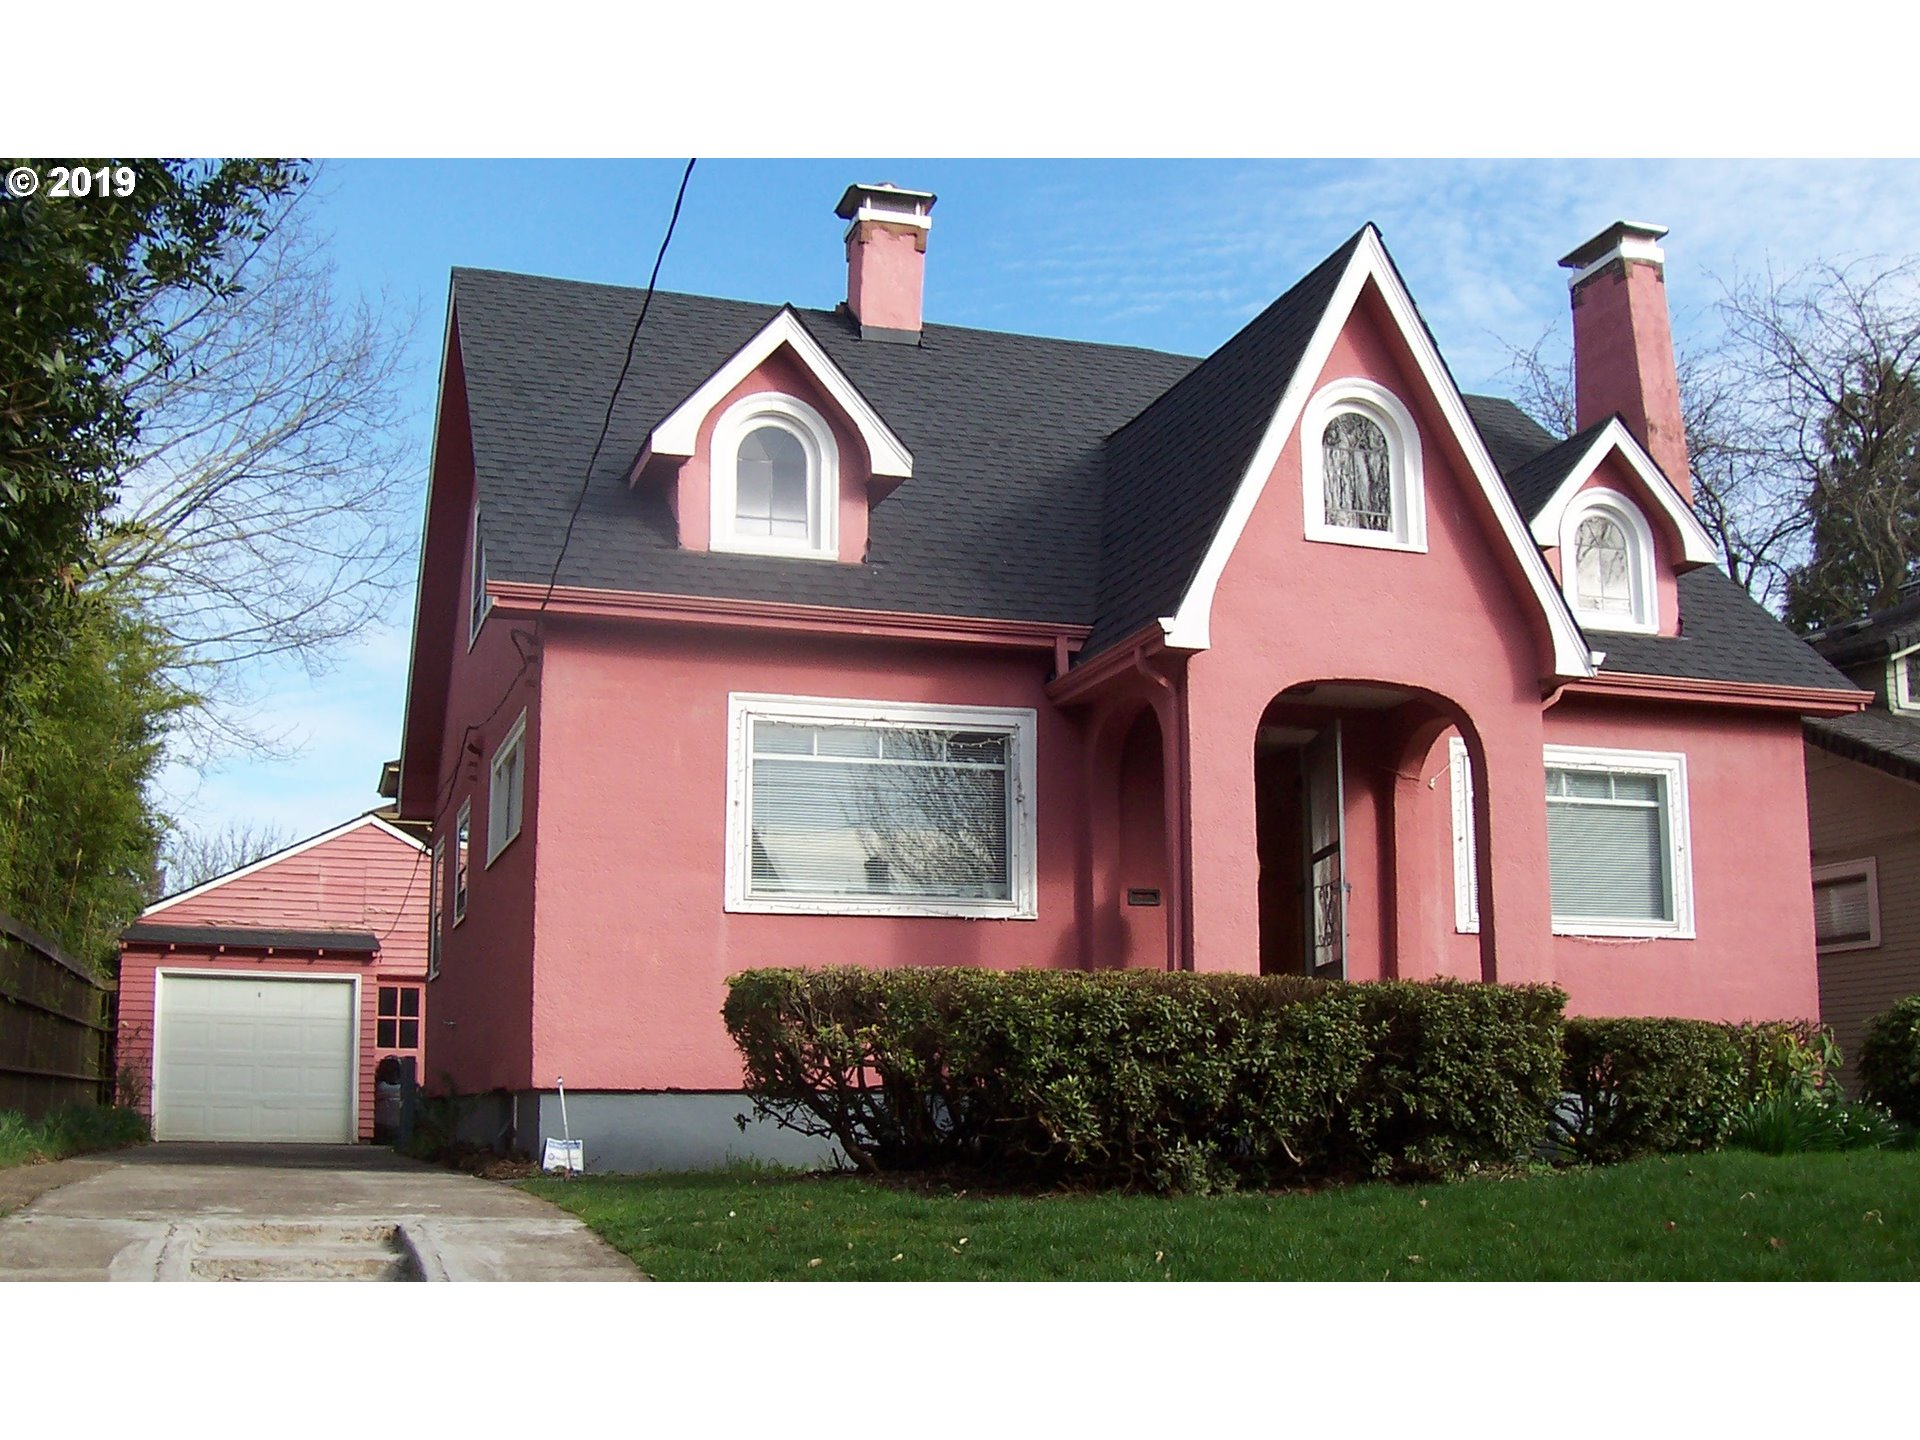 3016 NE 9TH AVE, Portland OR 97212